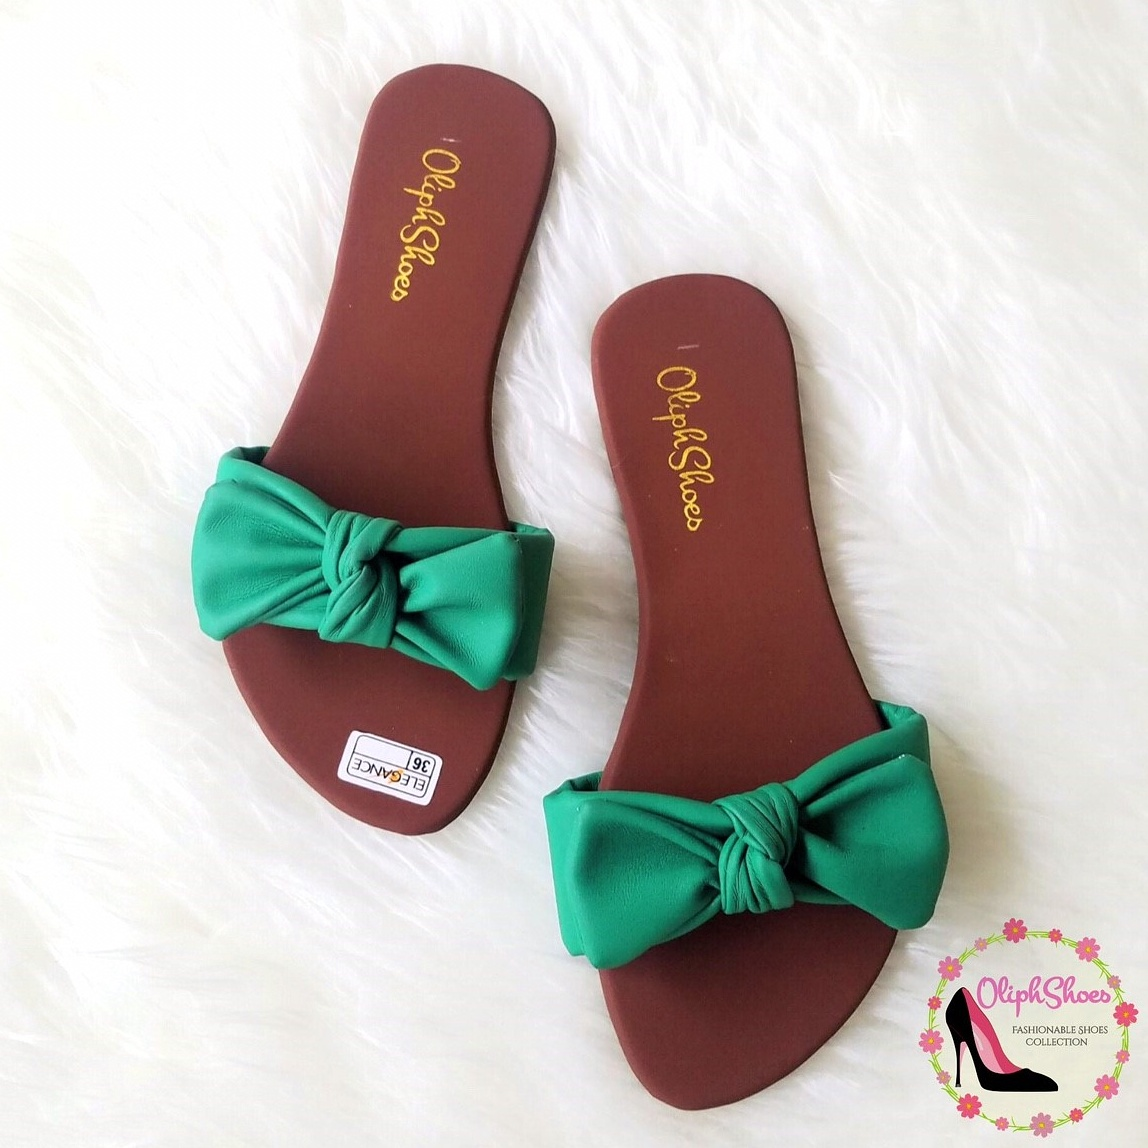 Sandal Santai Wanita - Sandal Cewek - Sandal Pita Kokop Hijau